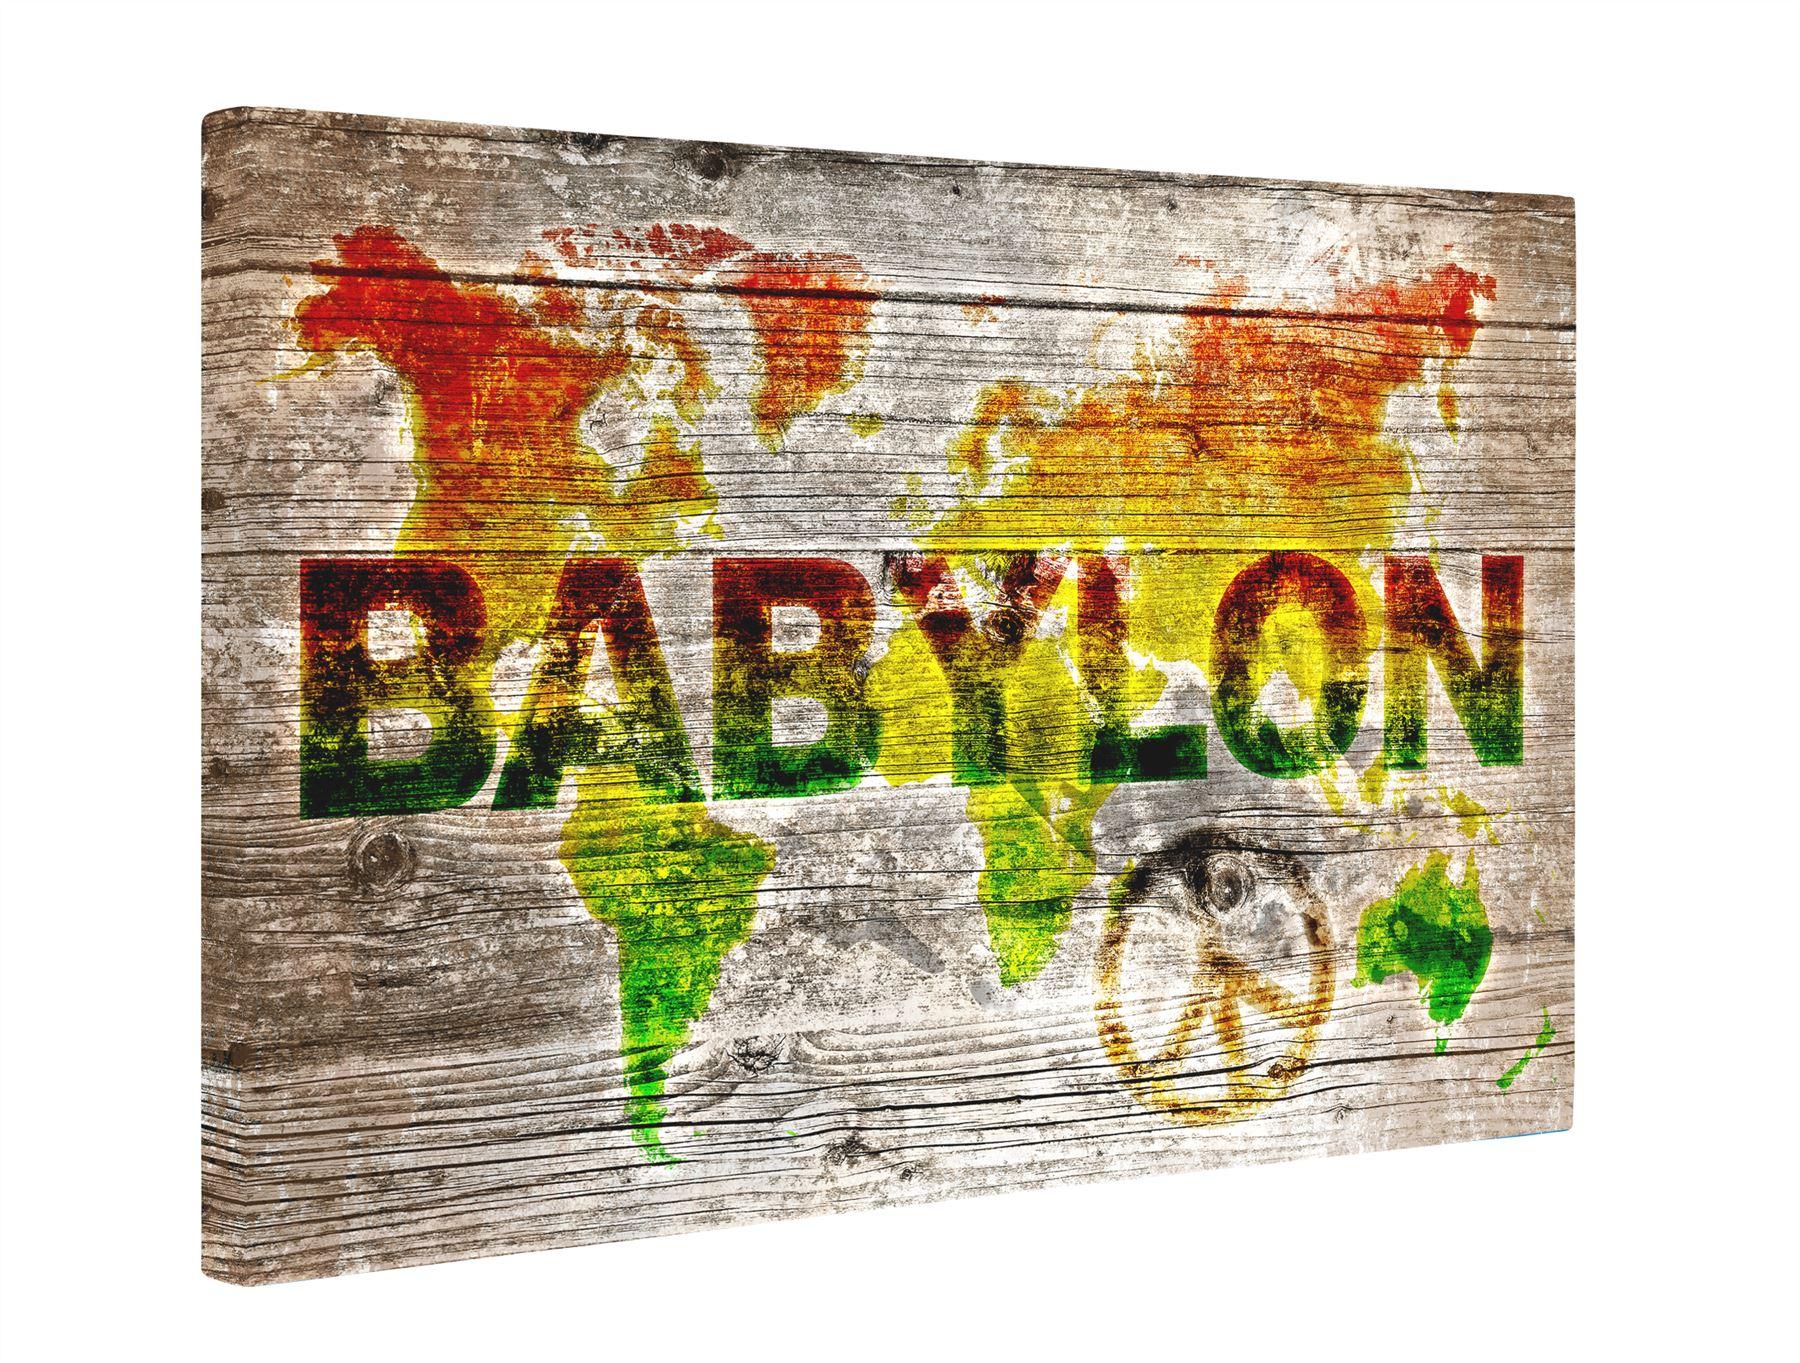 Reggae world map box canvas print wall art rasta bob marley atlas reggae world map box canvas print wall art rasta bob marley atlas gumiabroncs Gallery